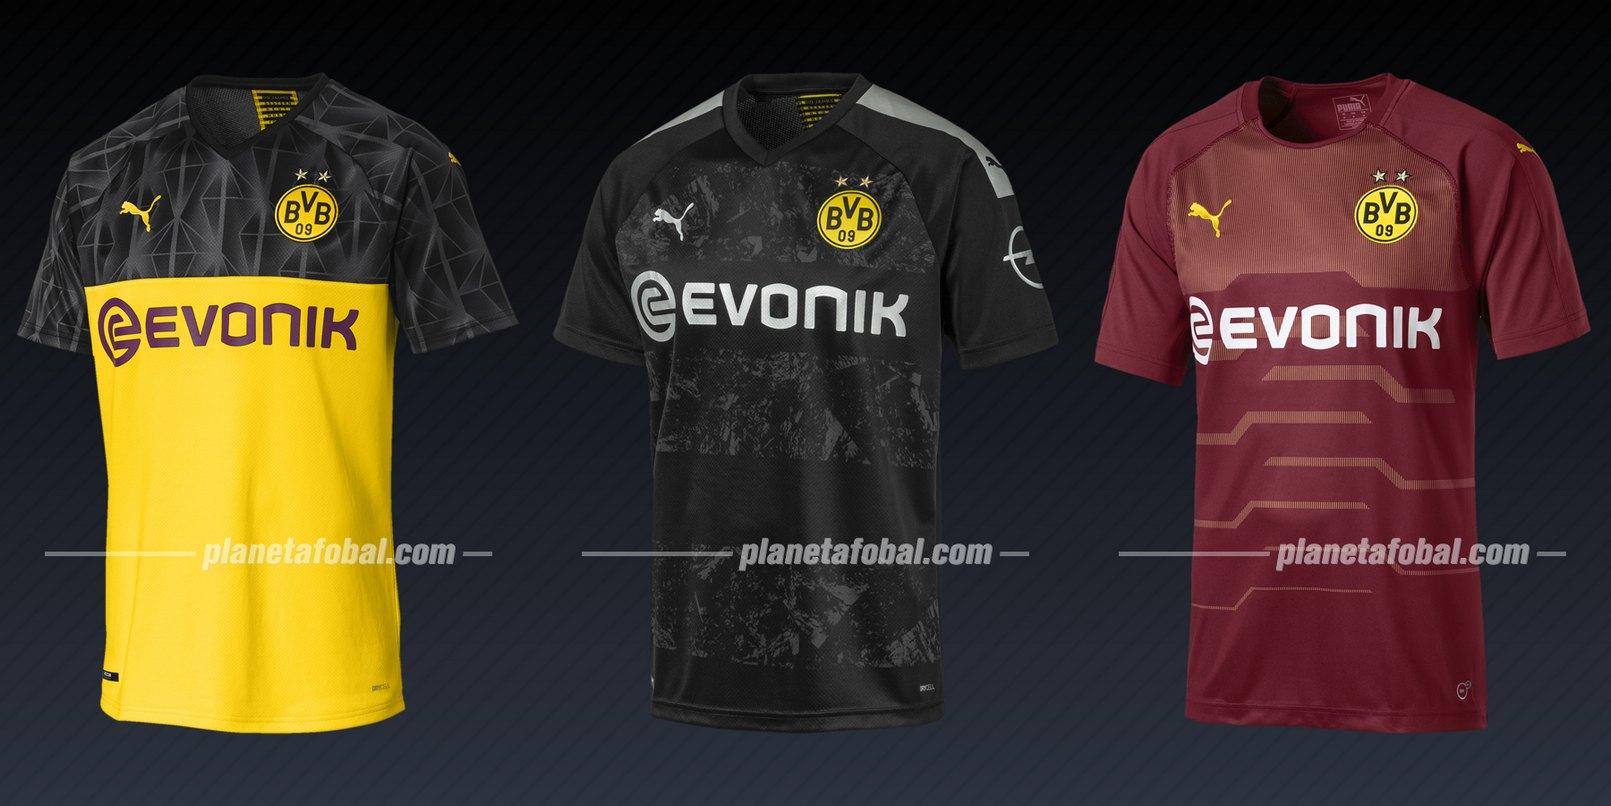 Borussia Dortmund (Puma) | Camisetas de la Liga de Campeones 2019/20